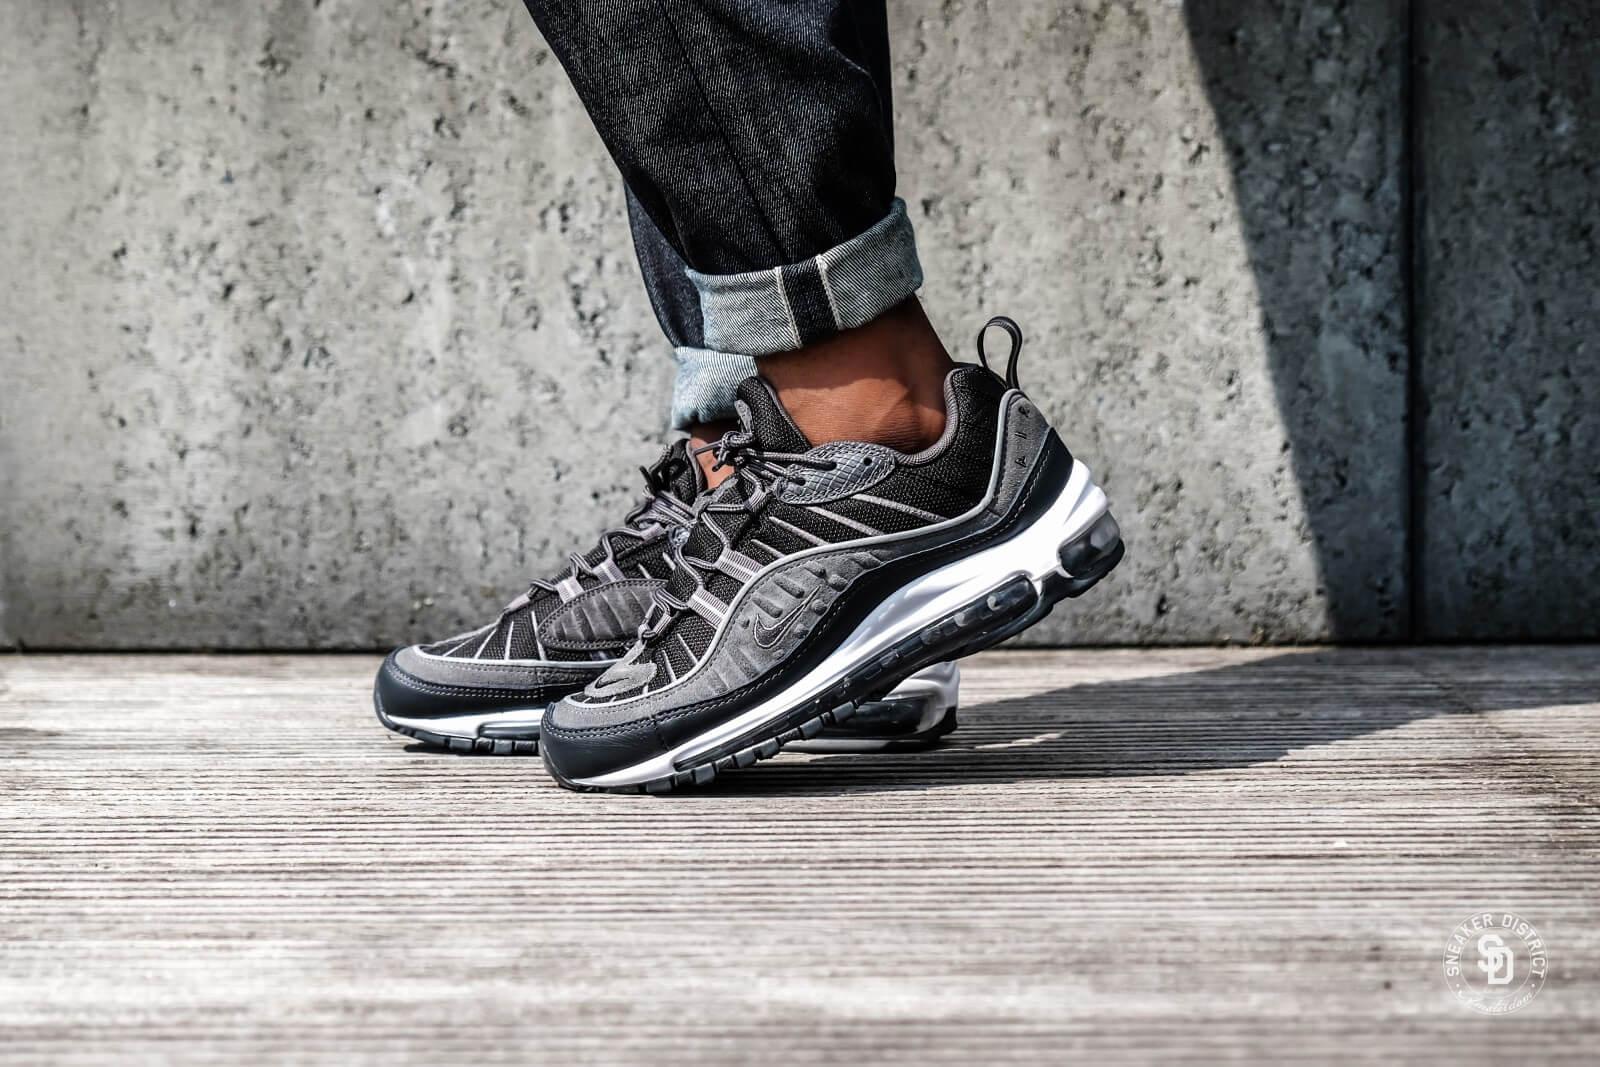 Nike Air Max 98 SE Black/Anthracite-Dark Grey-White